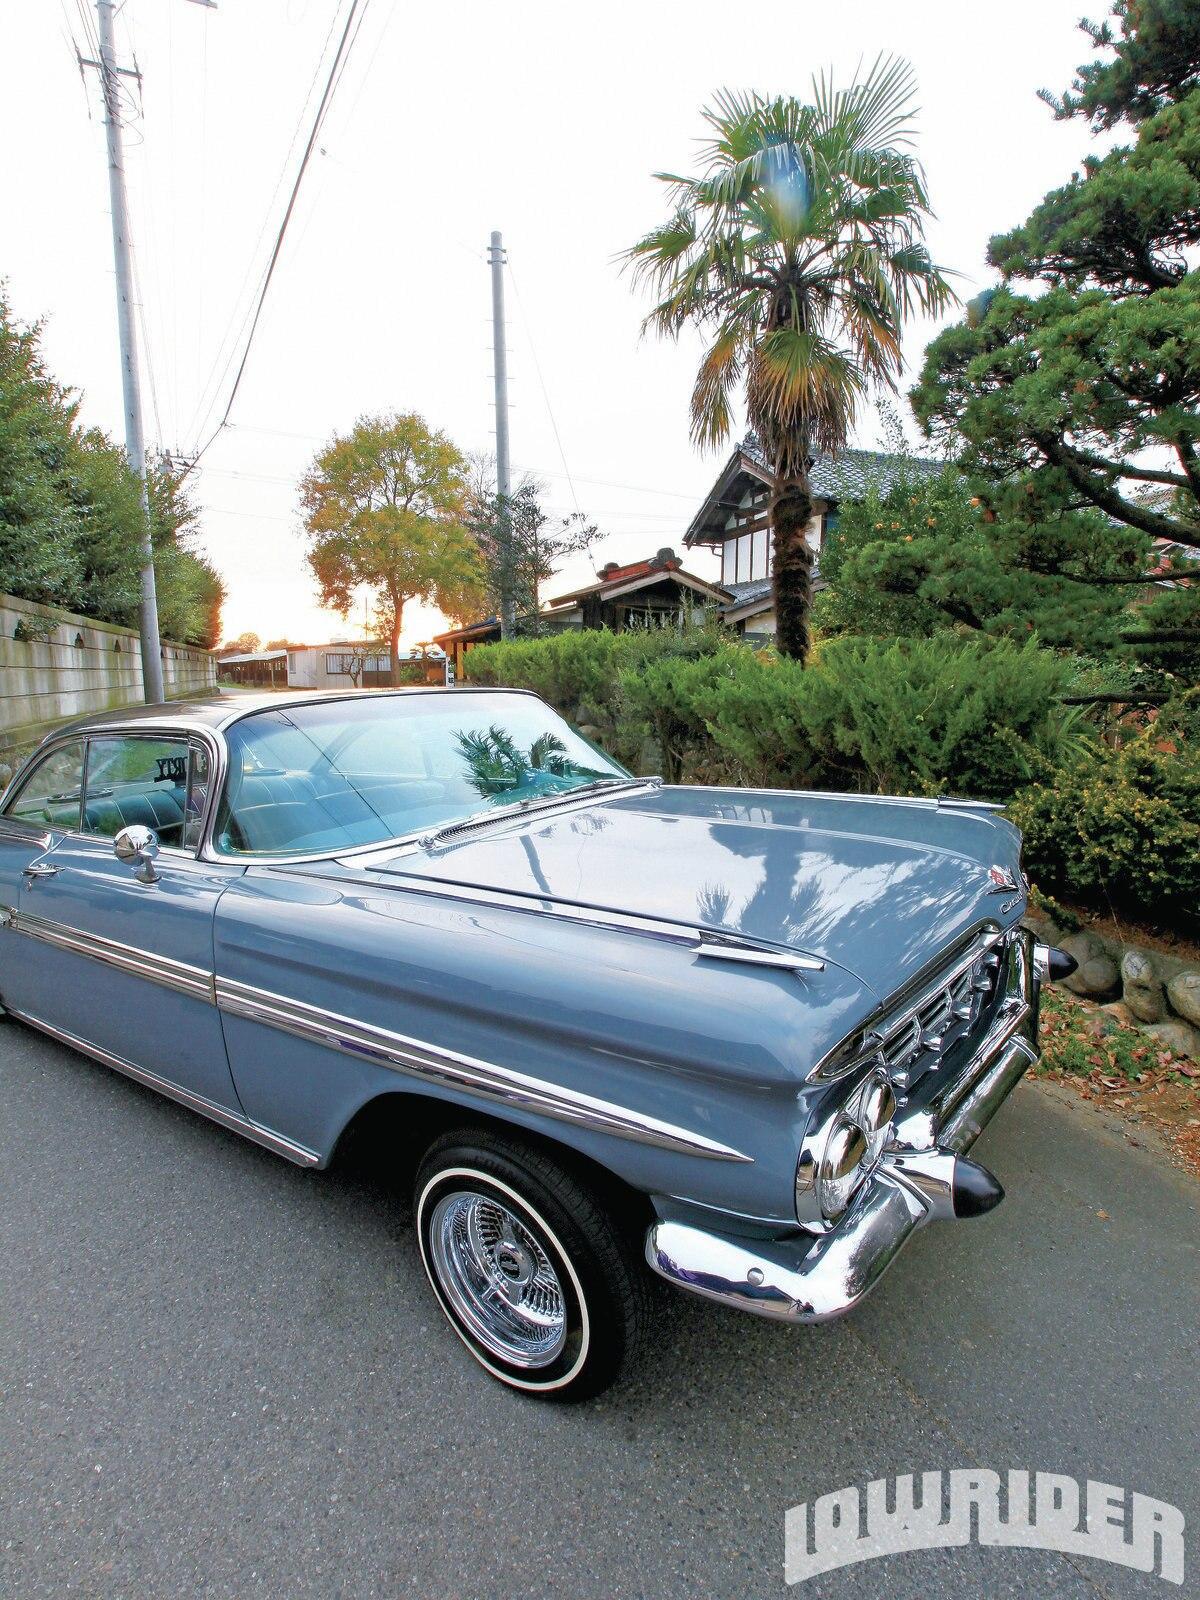 Lrmp O Lowrider On The Blvd Impala